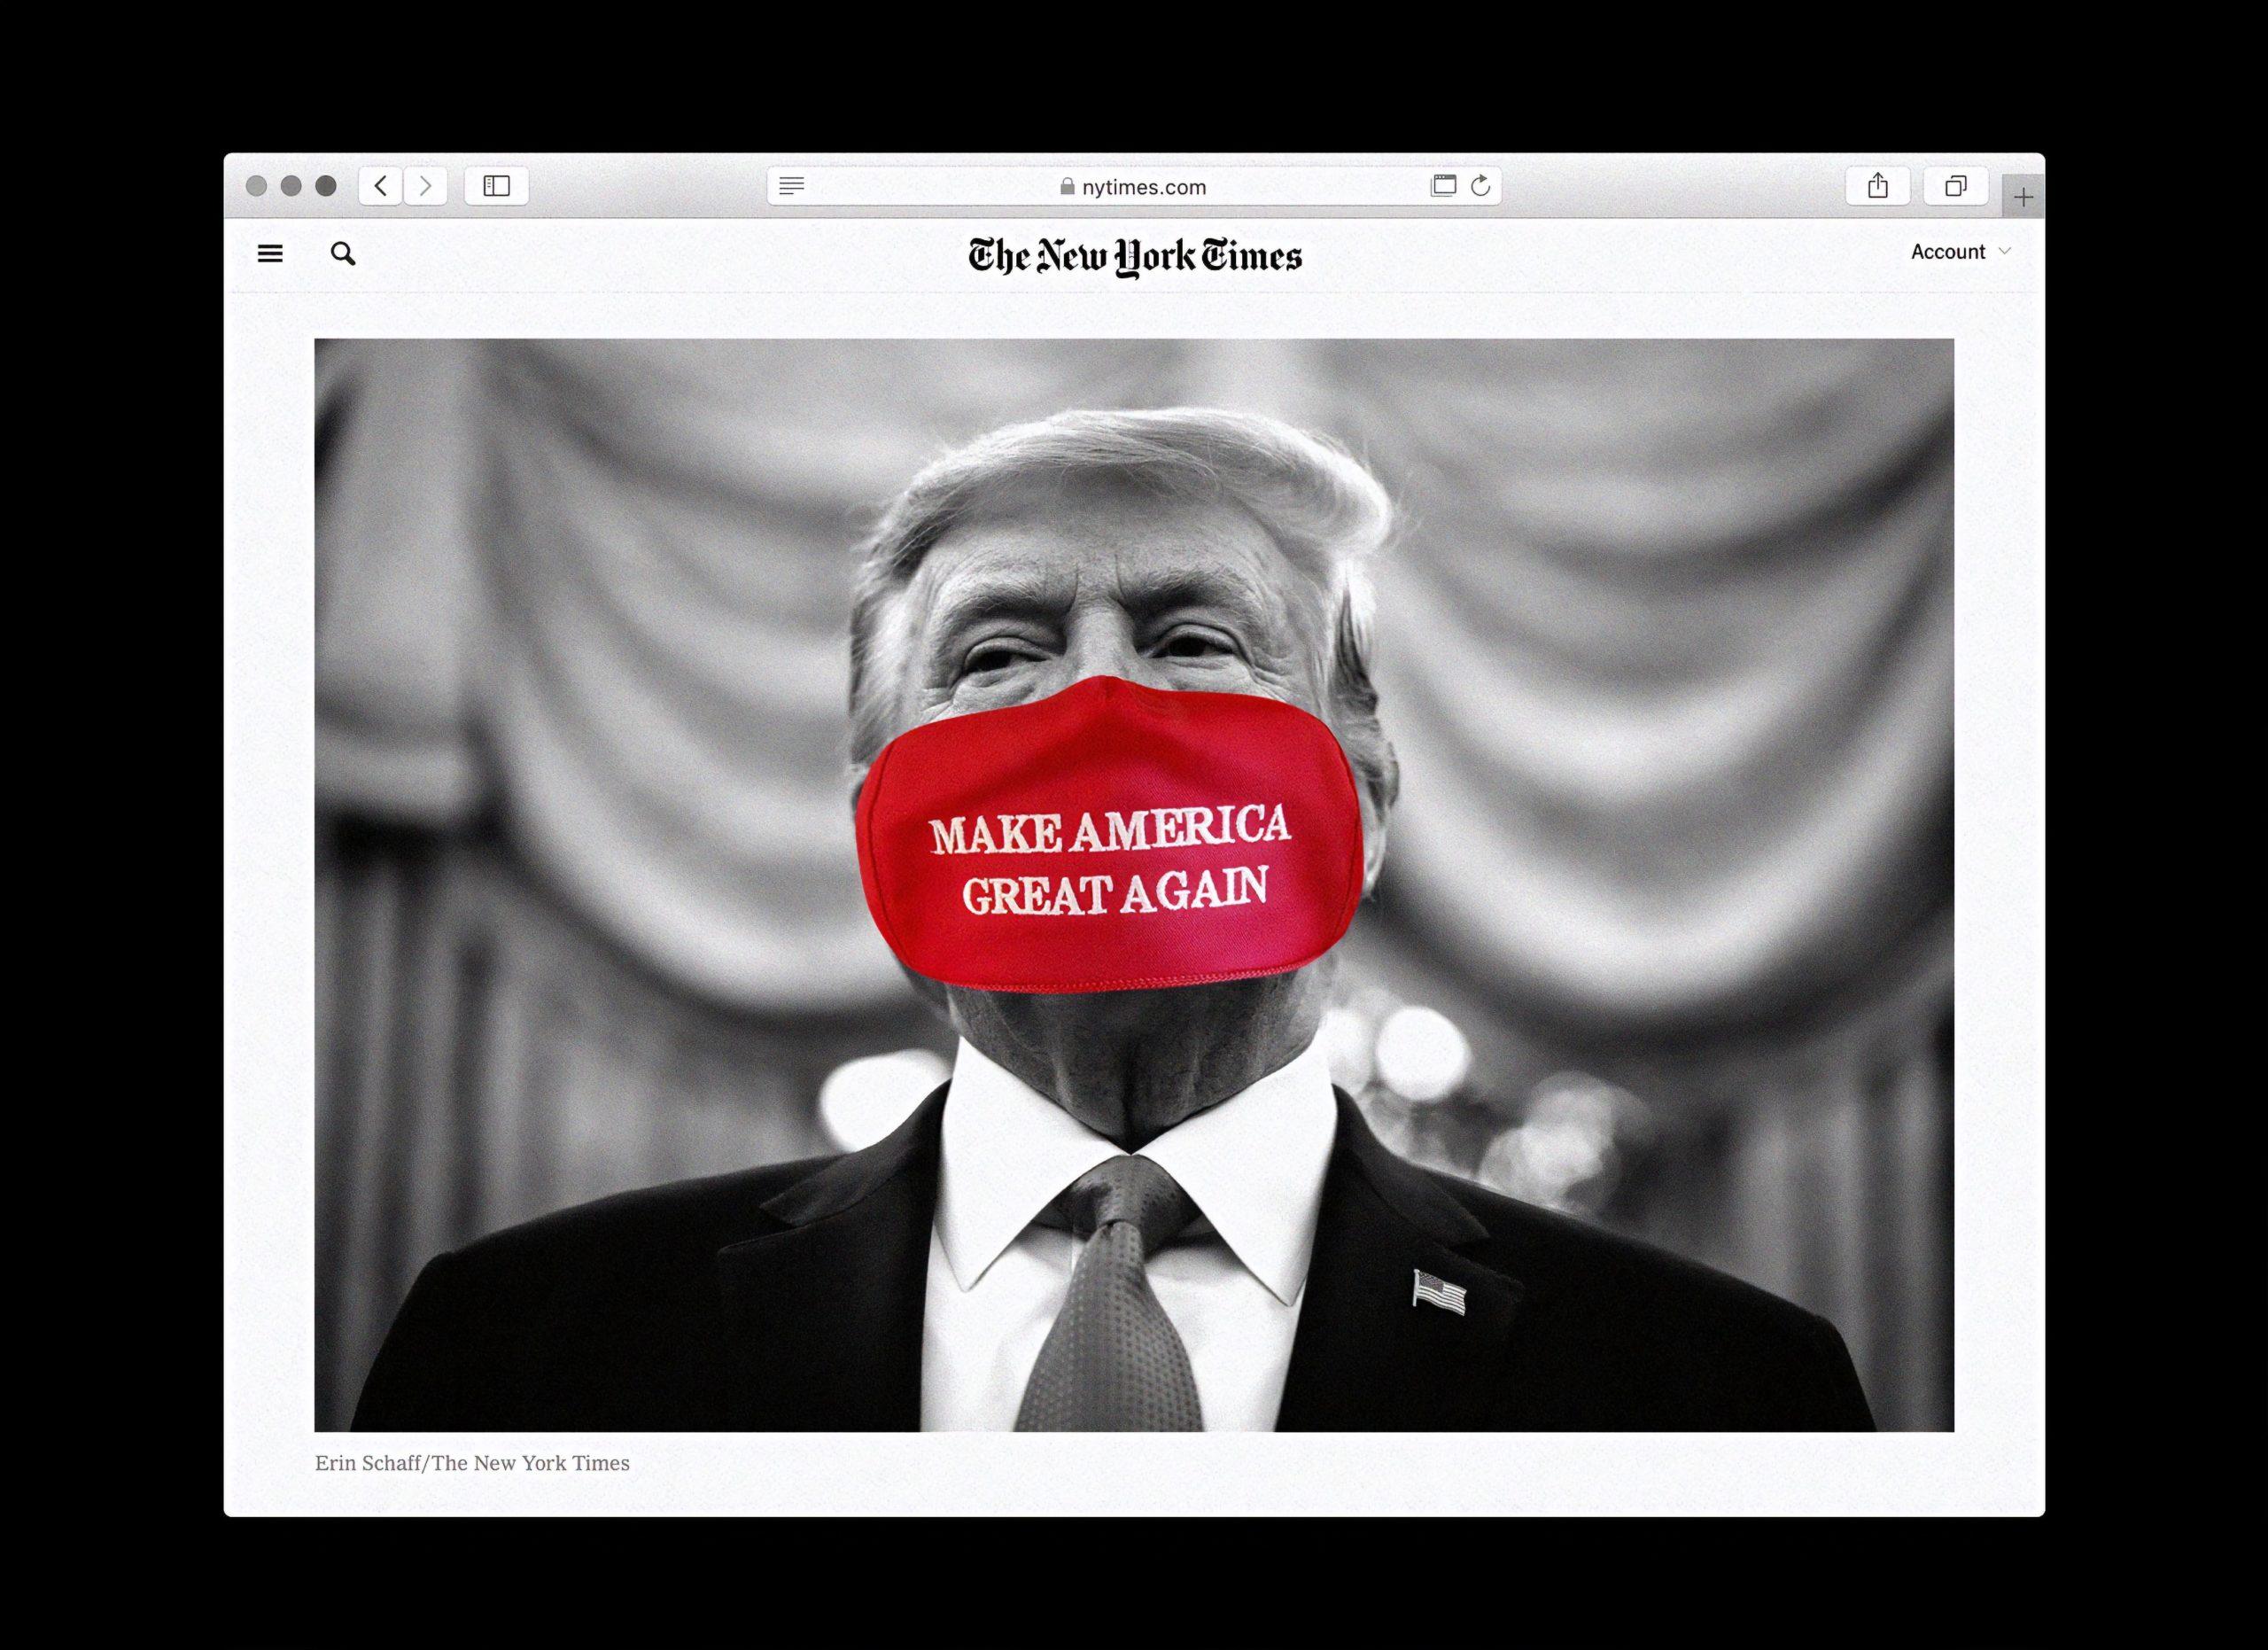 trump, politics, social media, communication